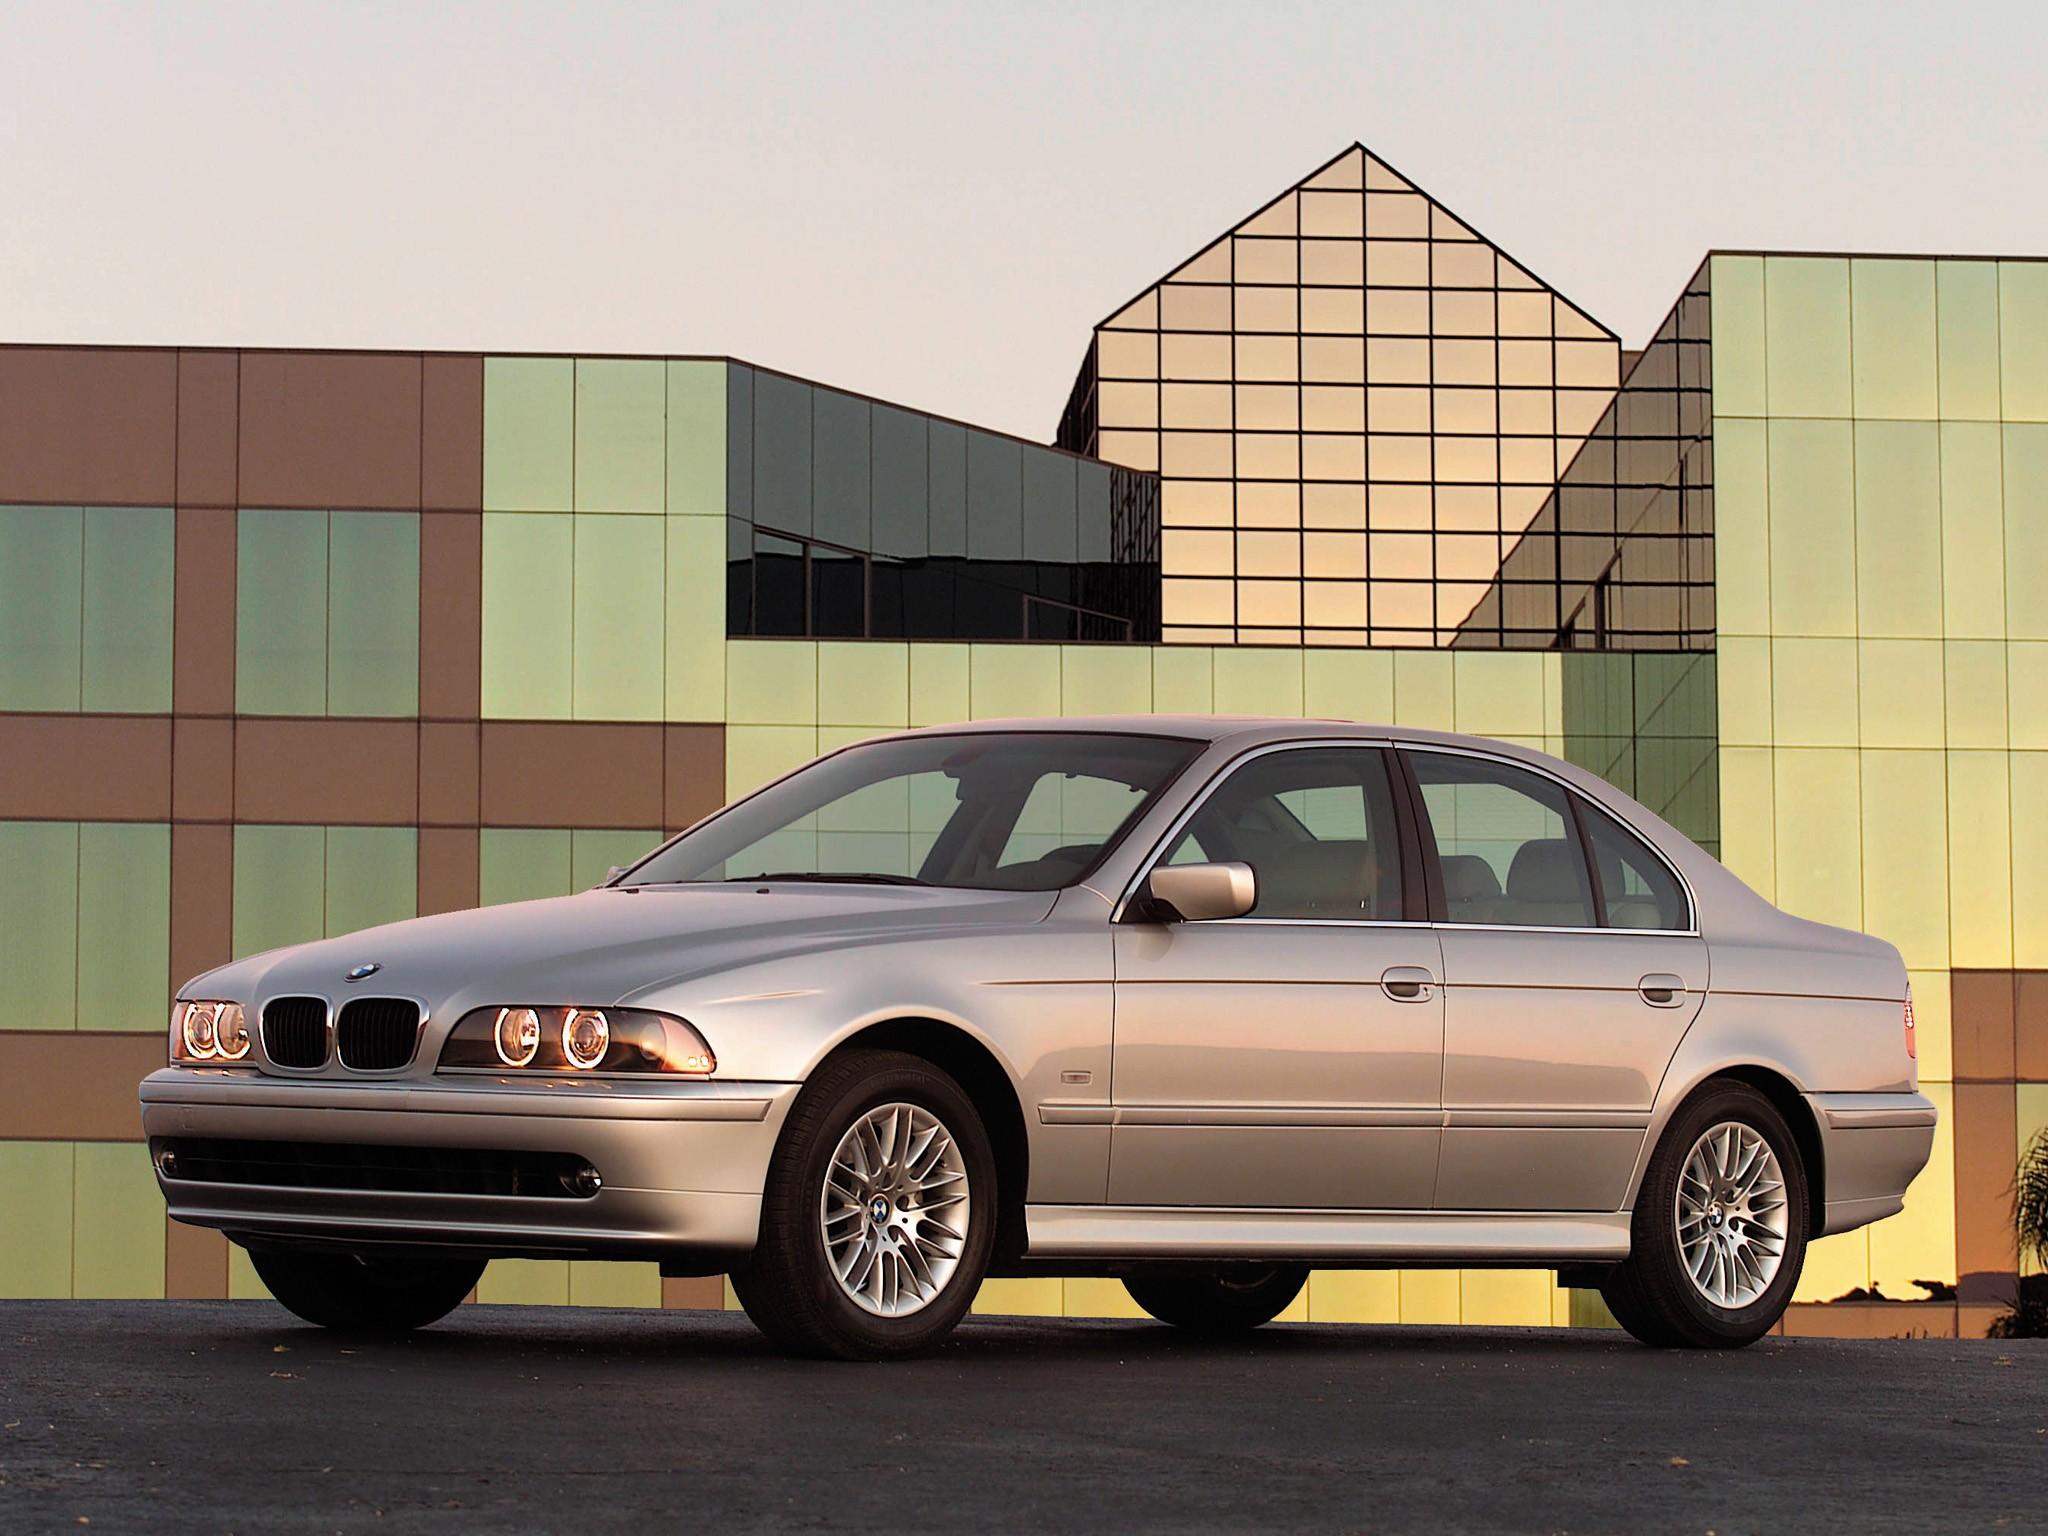 bmw e39 2000 series 530i 2003 sedan 523i srebrna 1996 1995 limousine 5er tapety restyling cars 2002 2001 eksterior autoevolution